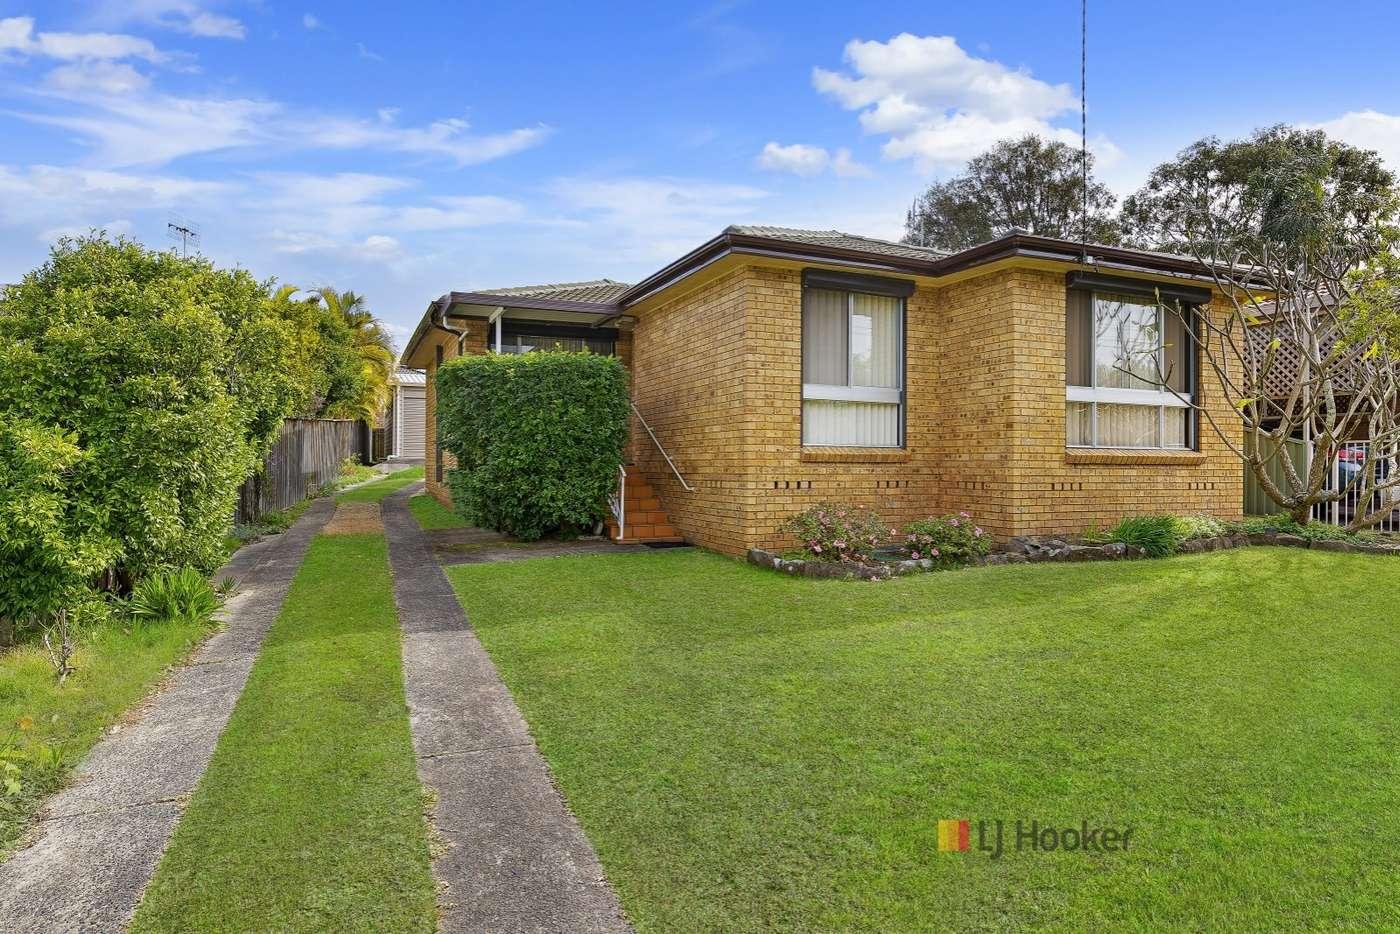 Main view of Homely house listing, 68 Doyle Avenue, Halekulani NSW 2262